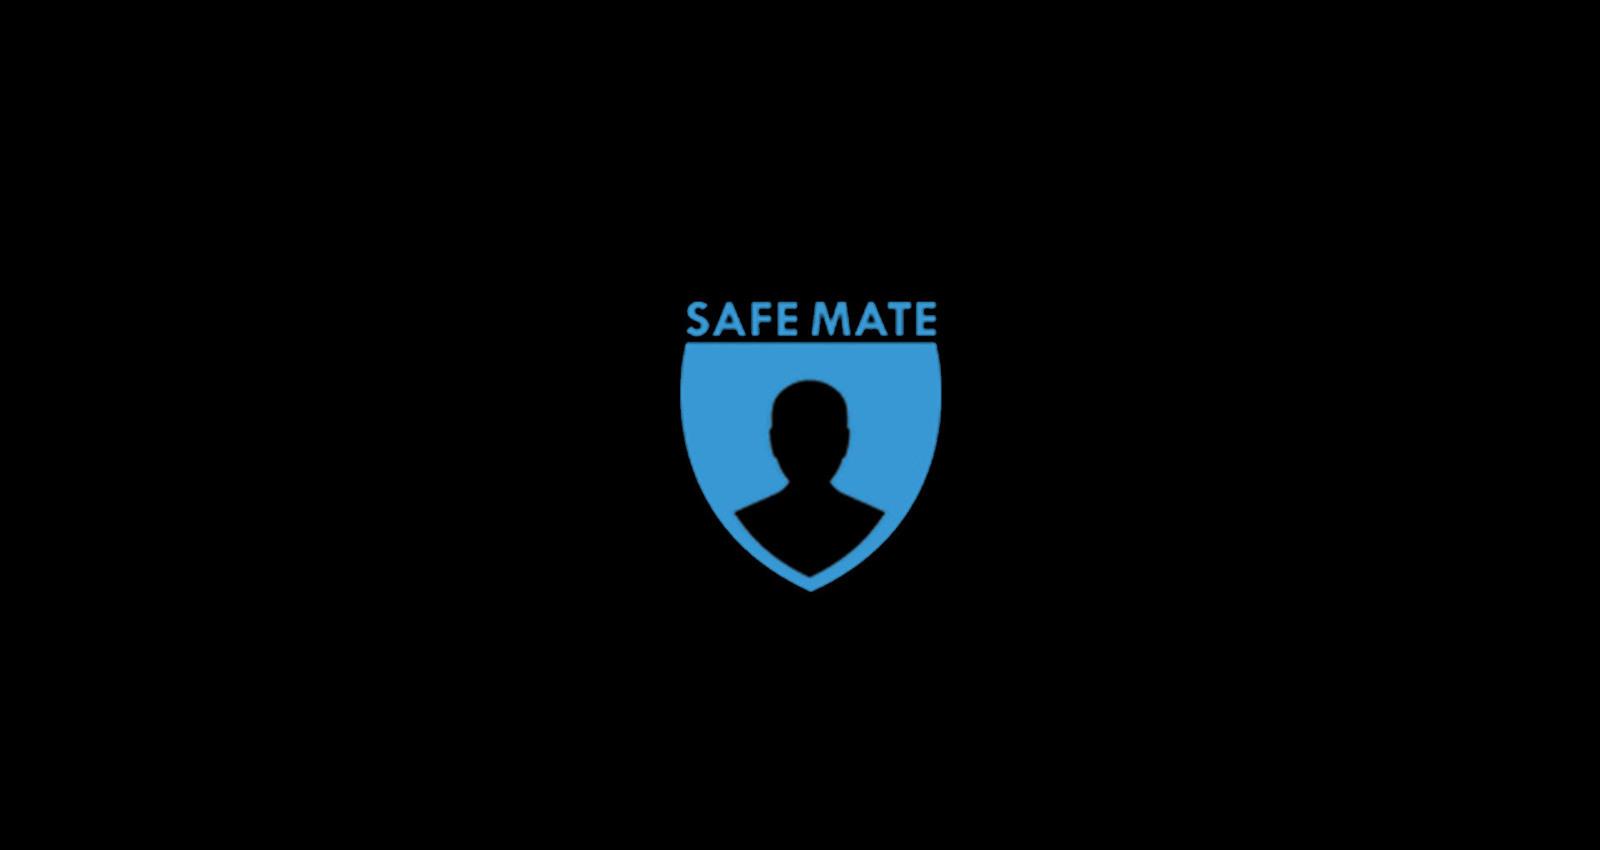 Safe Mate